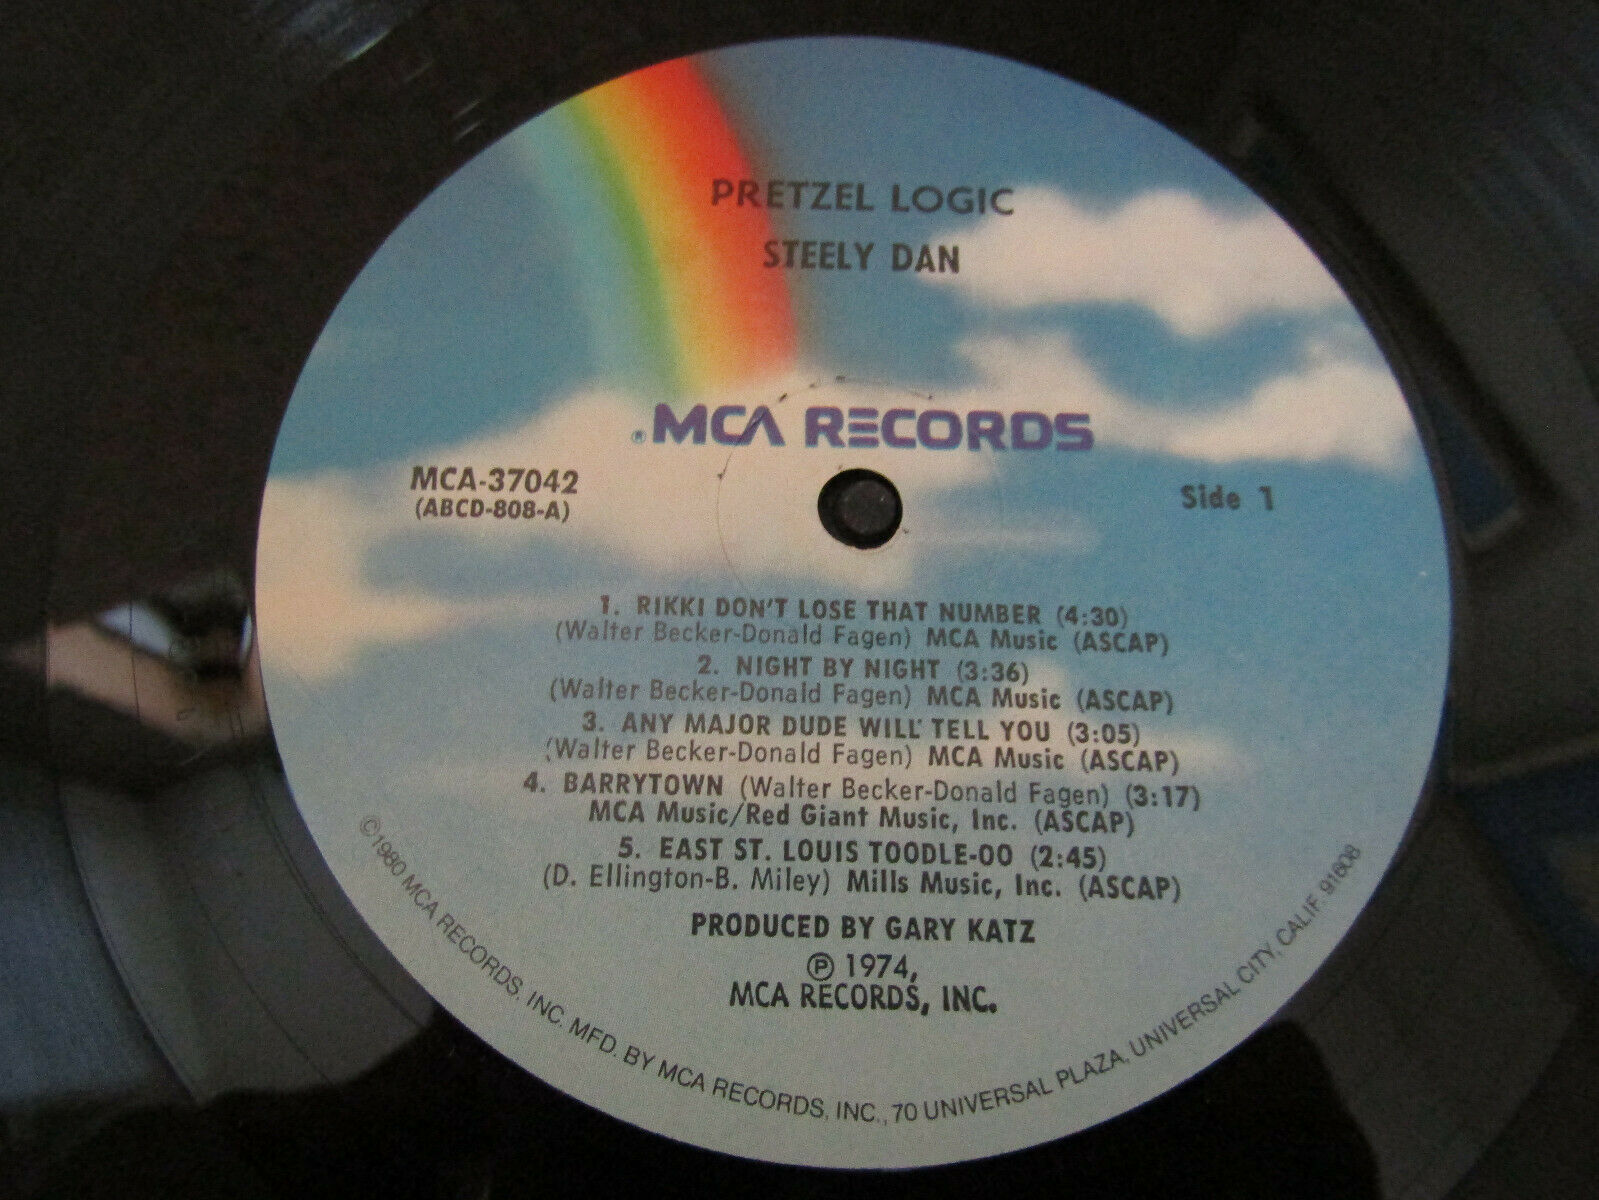 Steely Dan Pretzel Logic MCA MCA-37042 Stereo Vinyl Record LP image 4